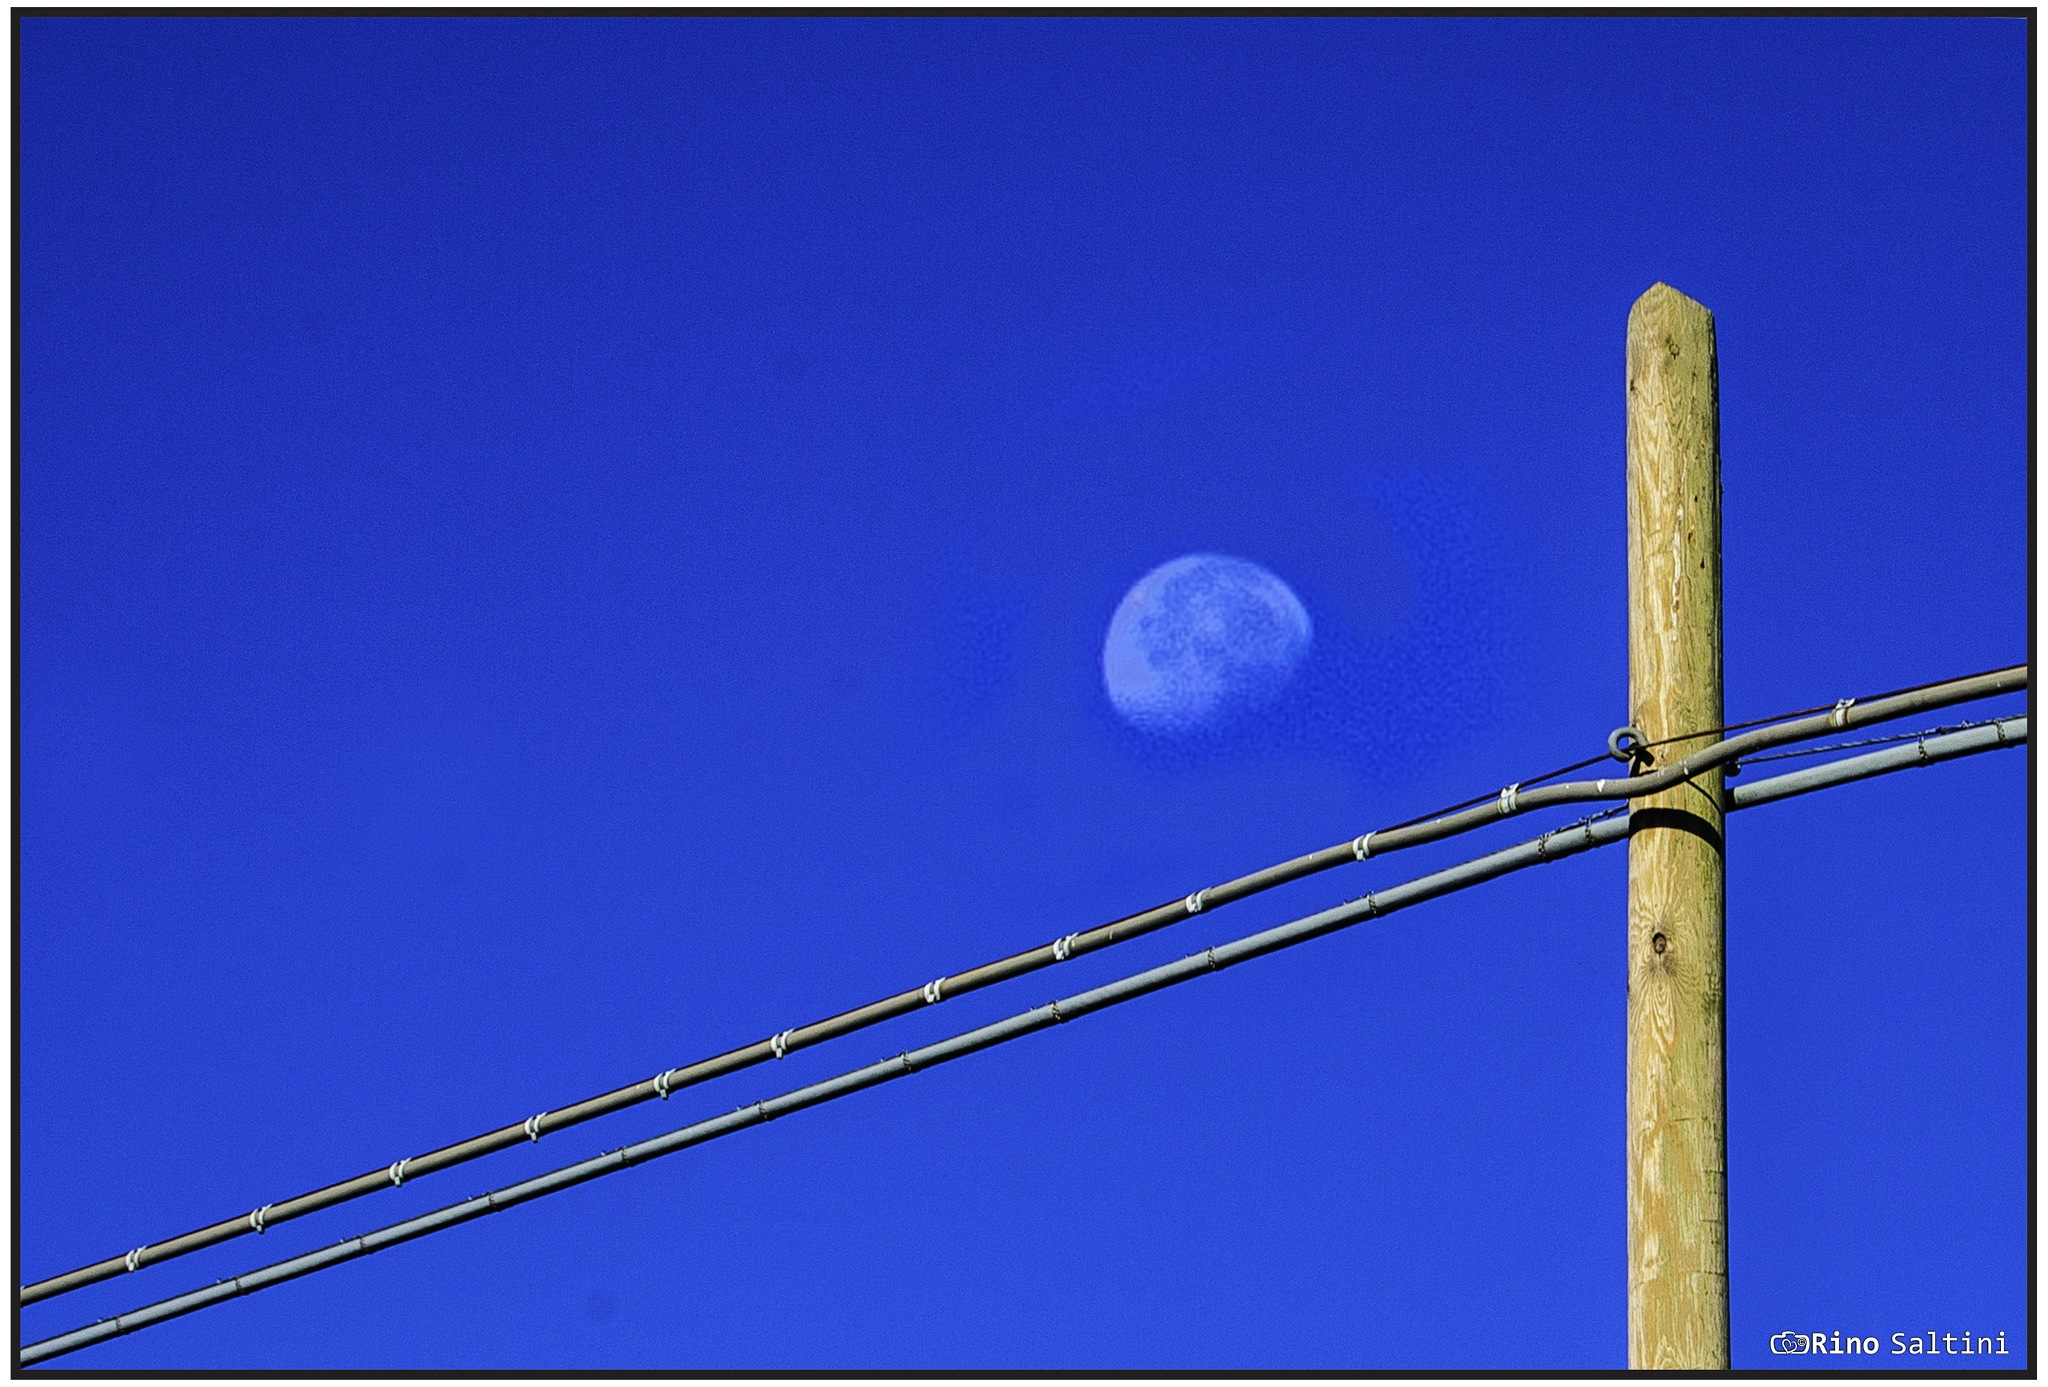 luna by Rino Saltini